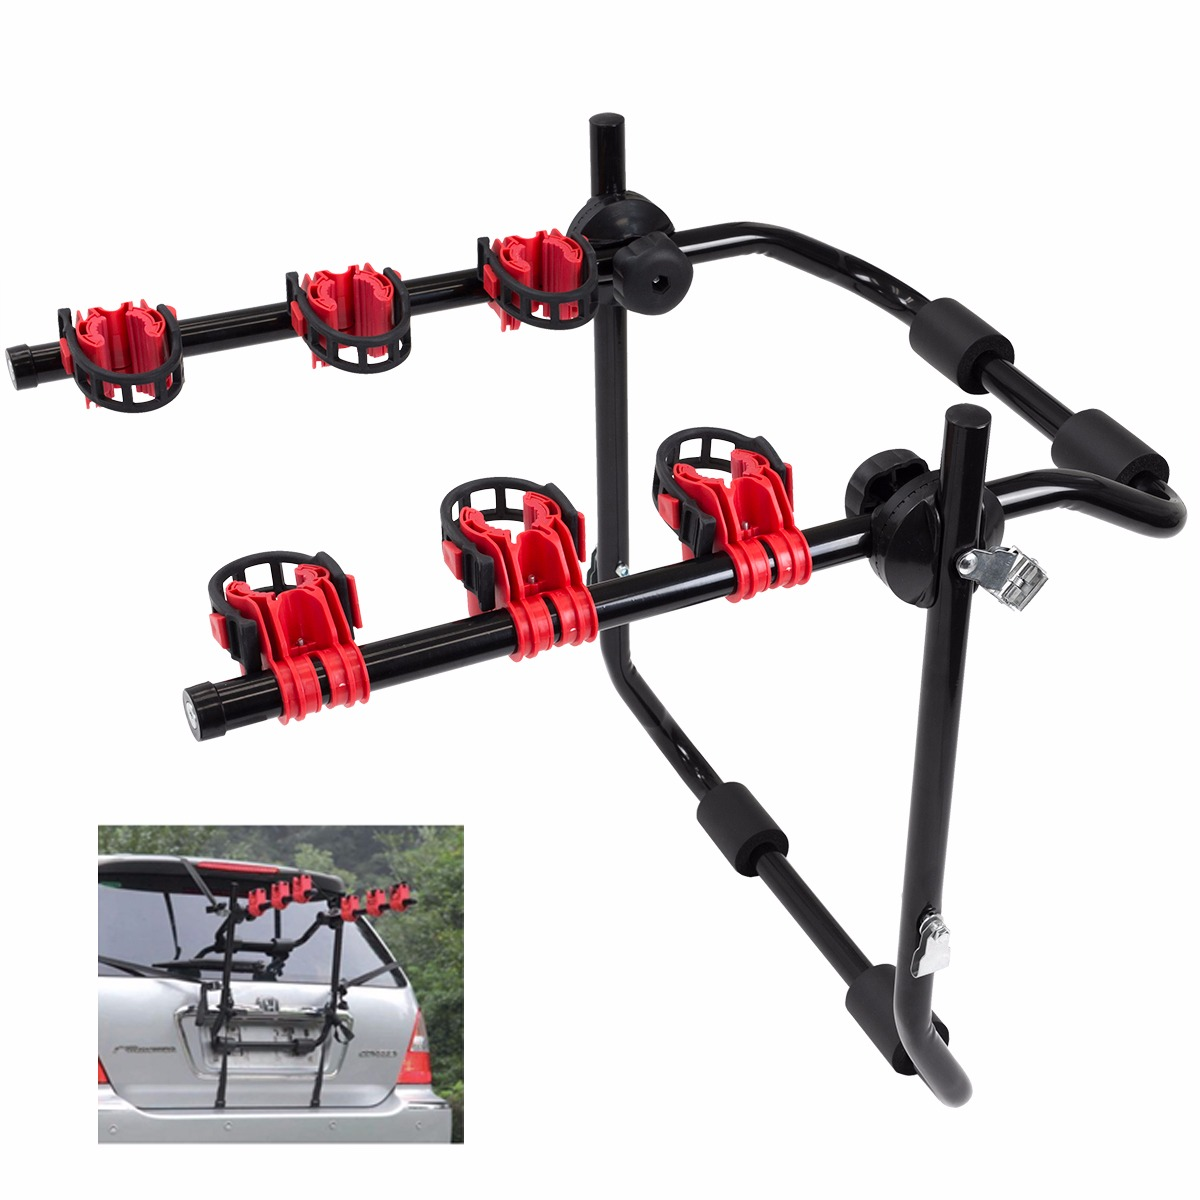 3-Bike Trunk-Mount Hatchback SUV Car Bicycle Carrier pannier Rack by